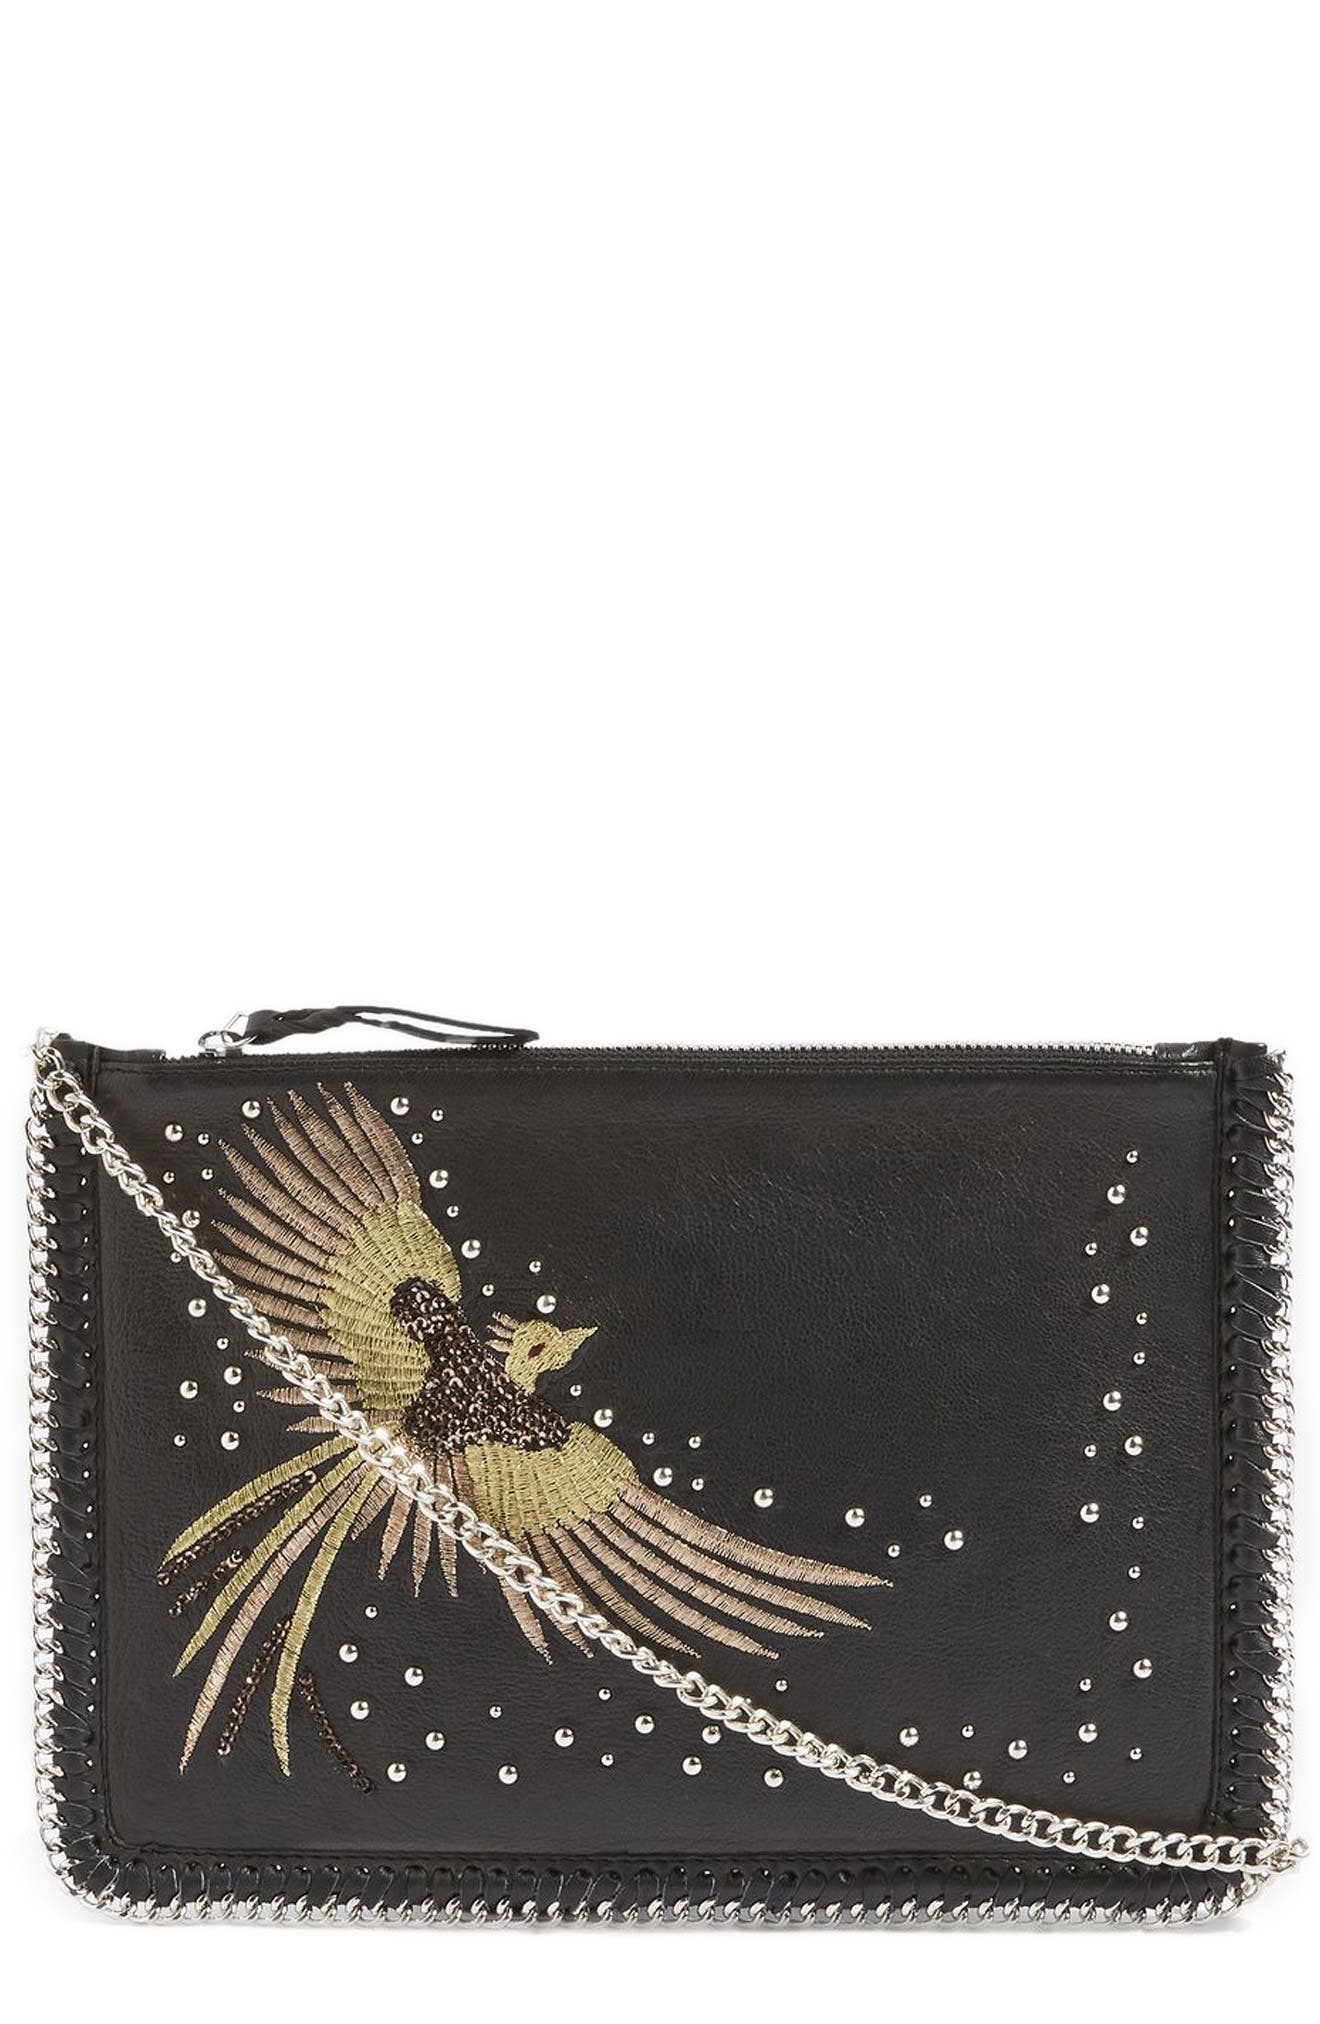 New Ava Bird Leather Crossbody Bag,                         Main,                         color, Black Multi